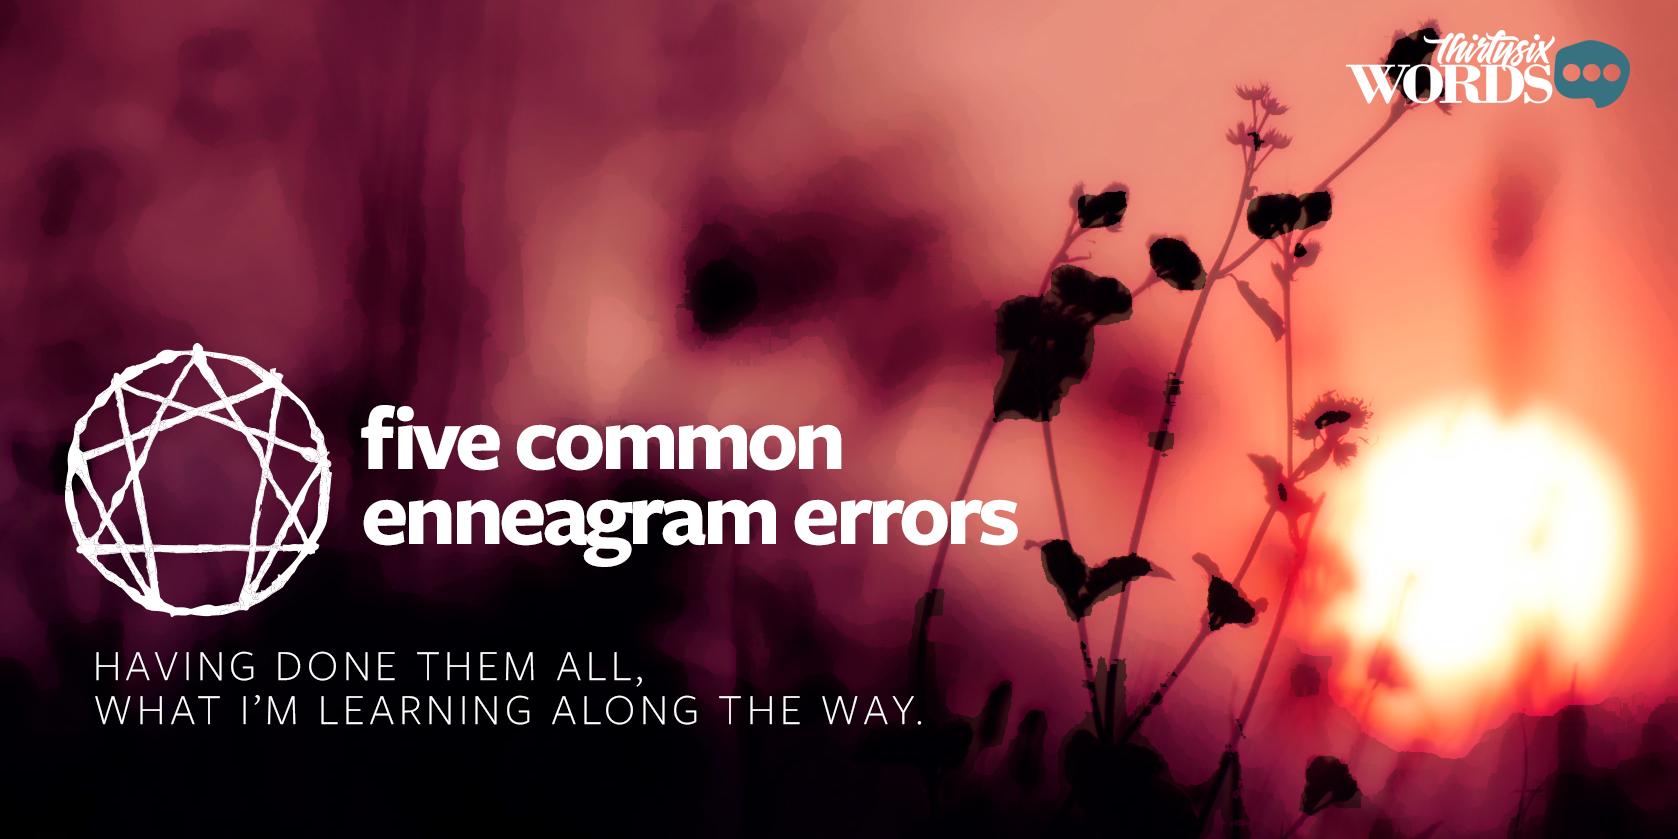 enneagram errors header.png